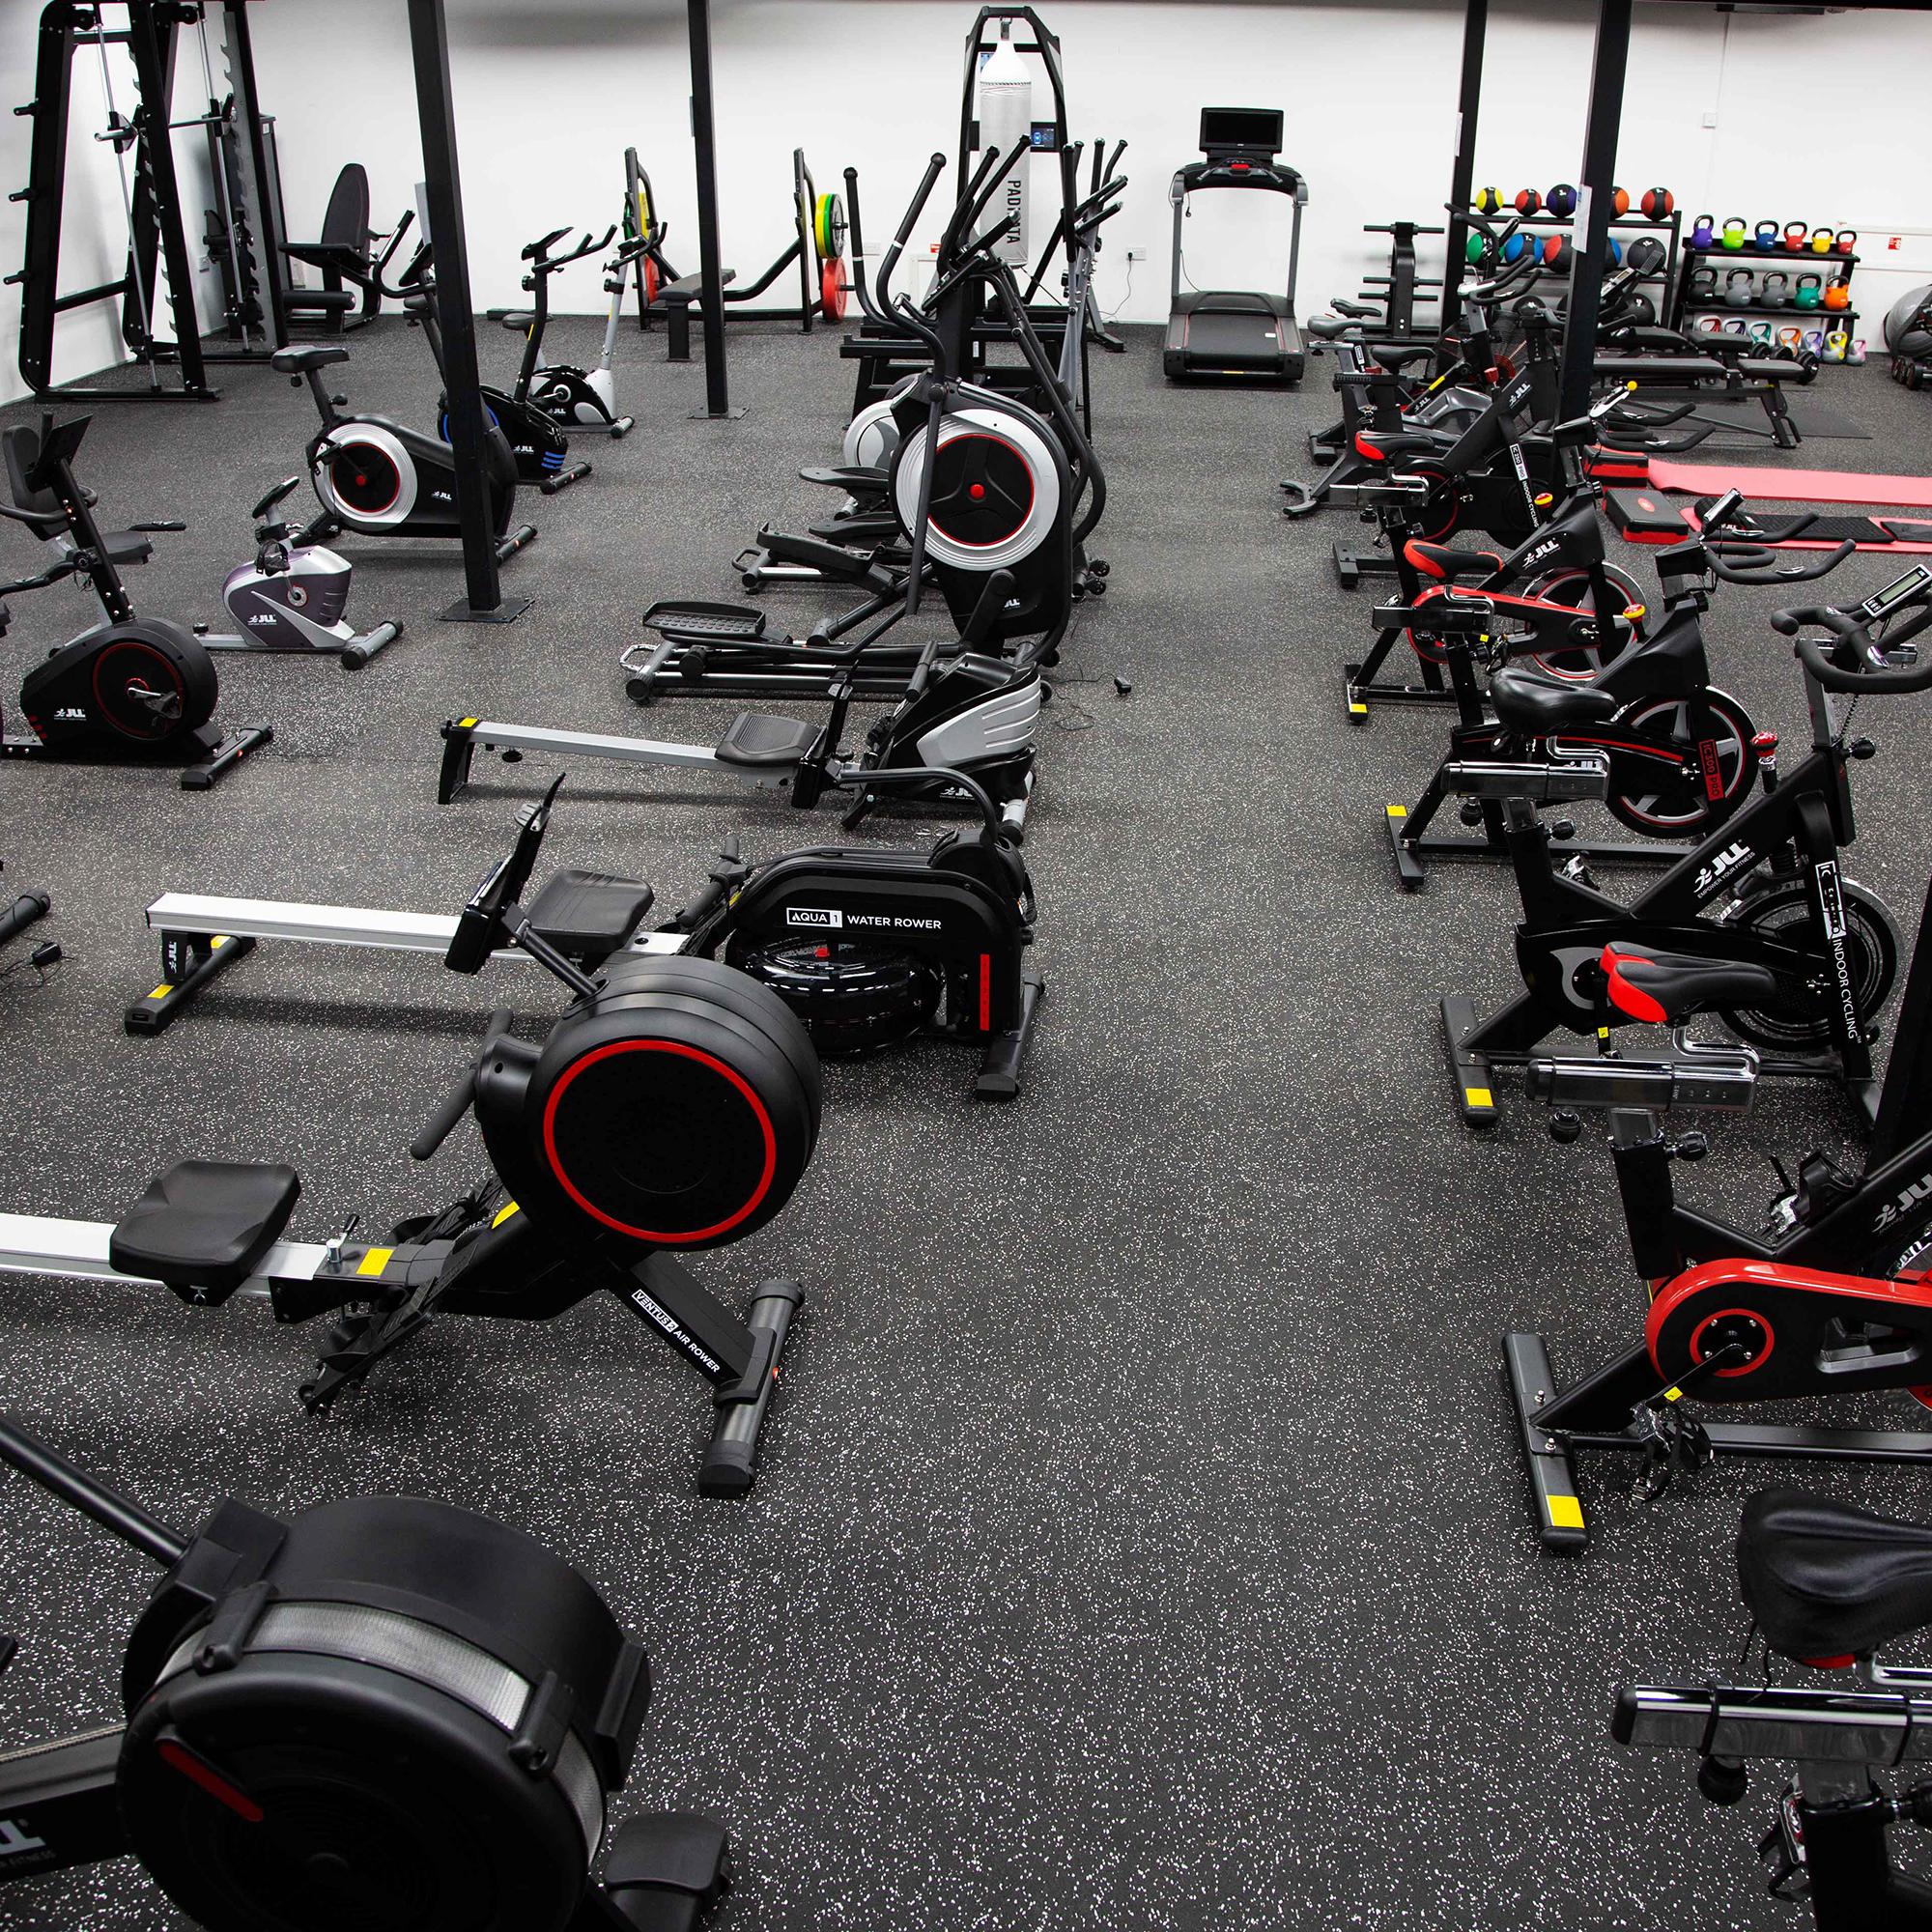 JLL Fitness Treadmills Stock